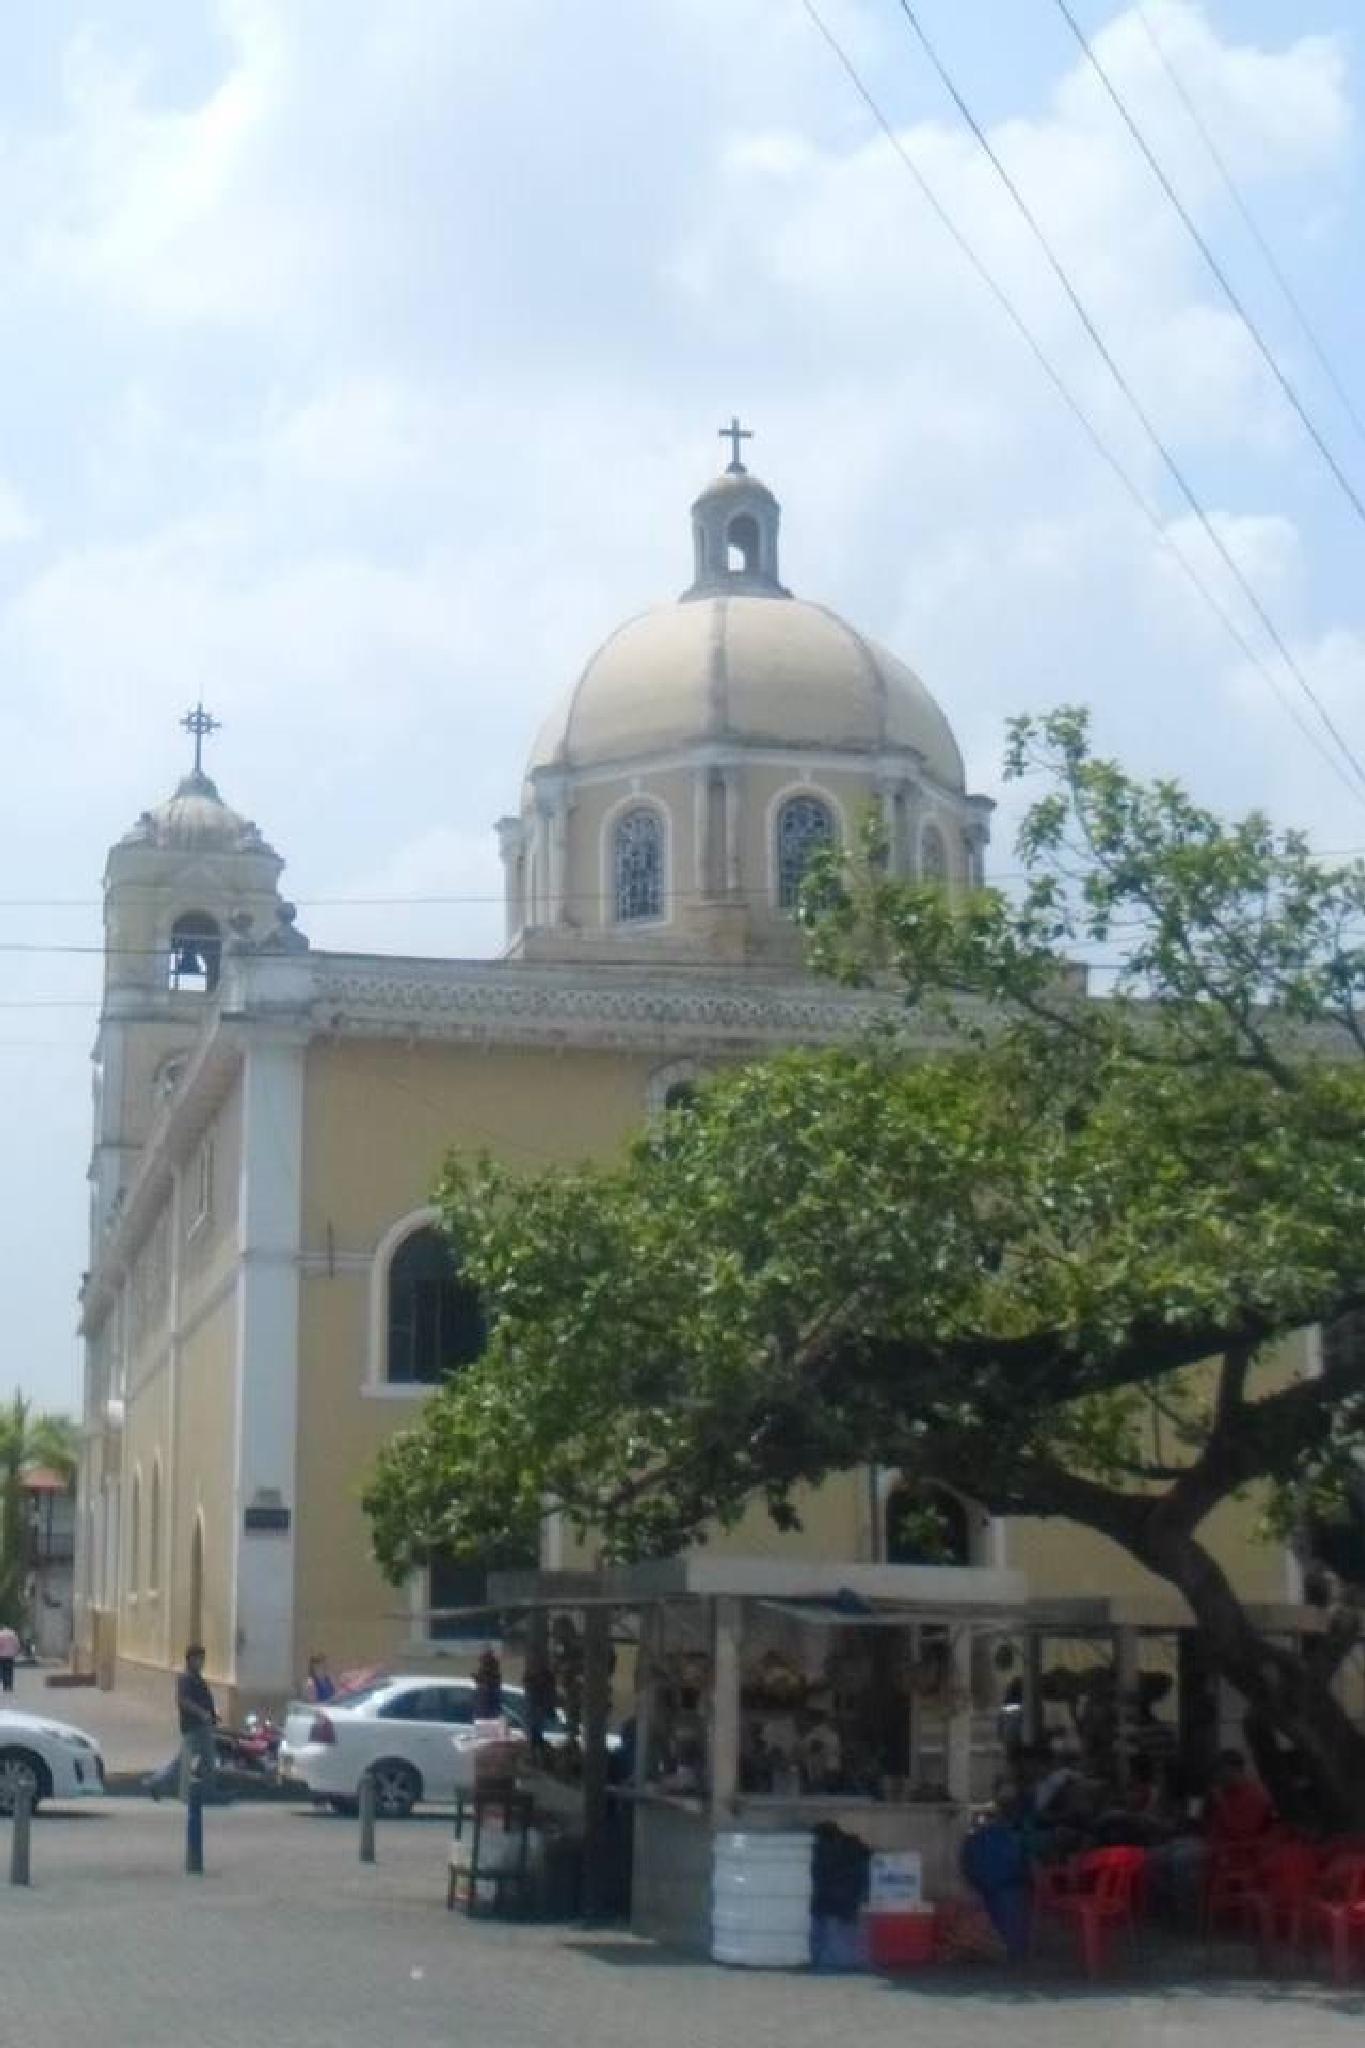 Sincelejo Church by castariza